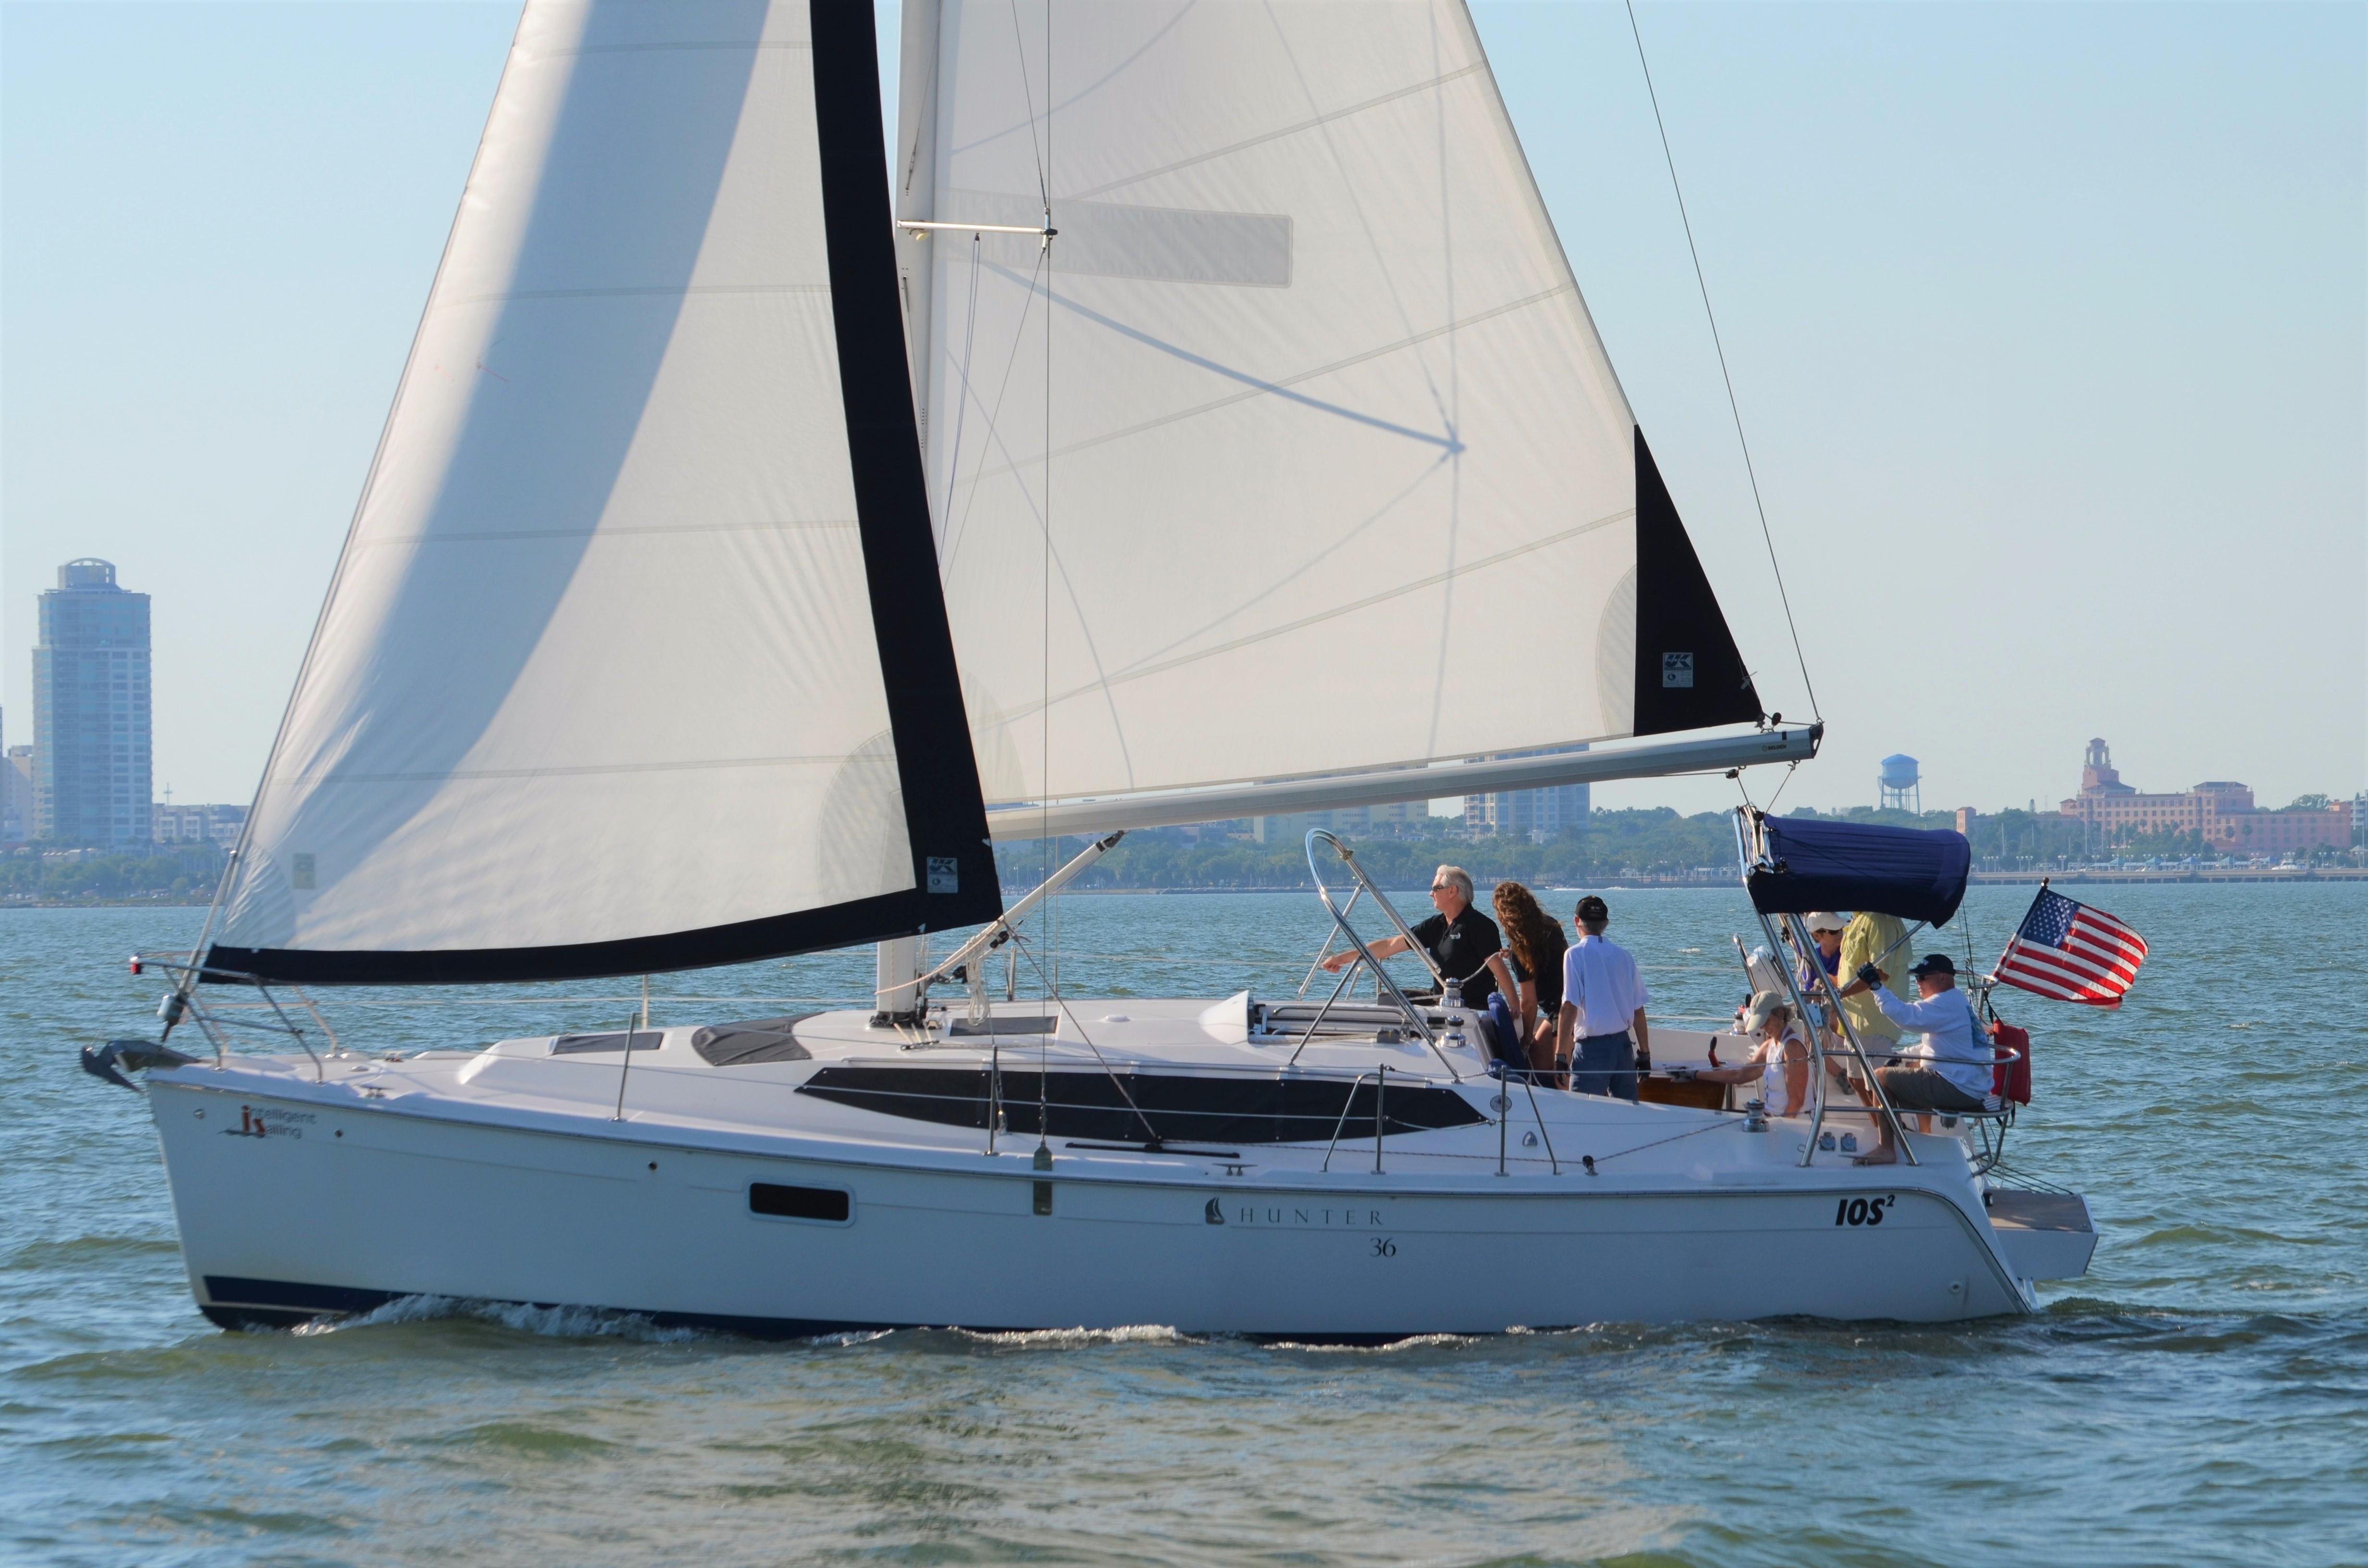 2013 Hunter 36 Sail Boat For Sale Wwwyachtworldcom